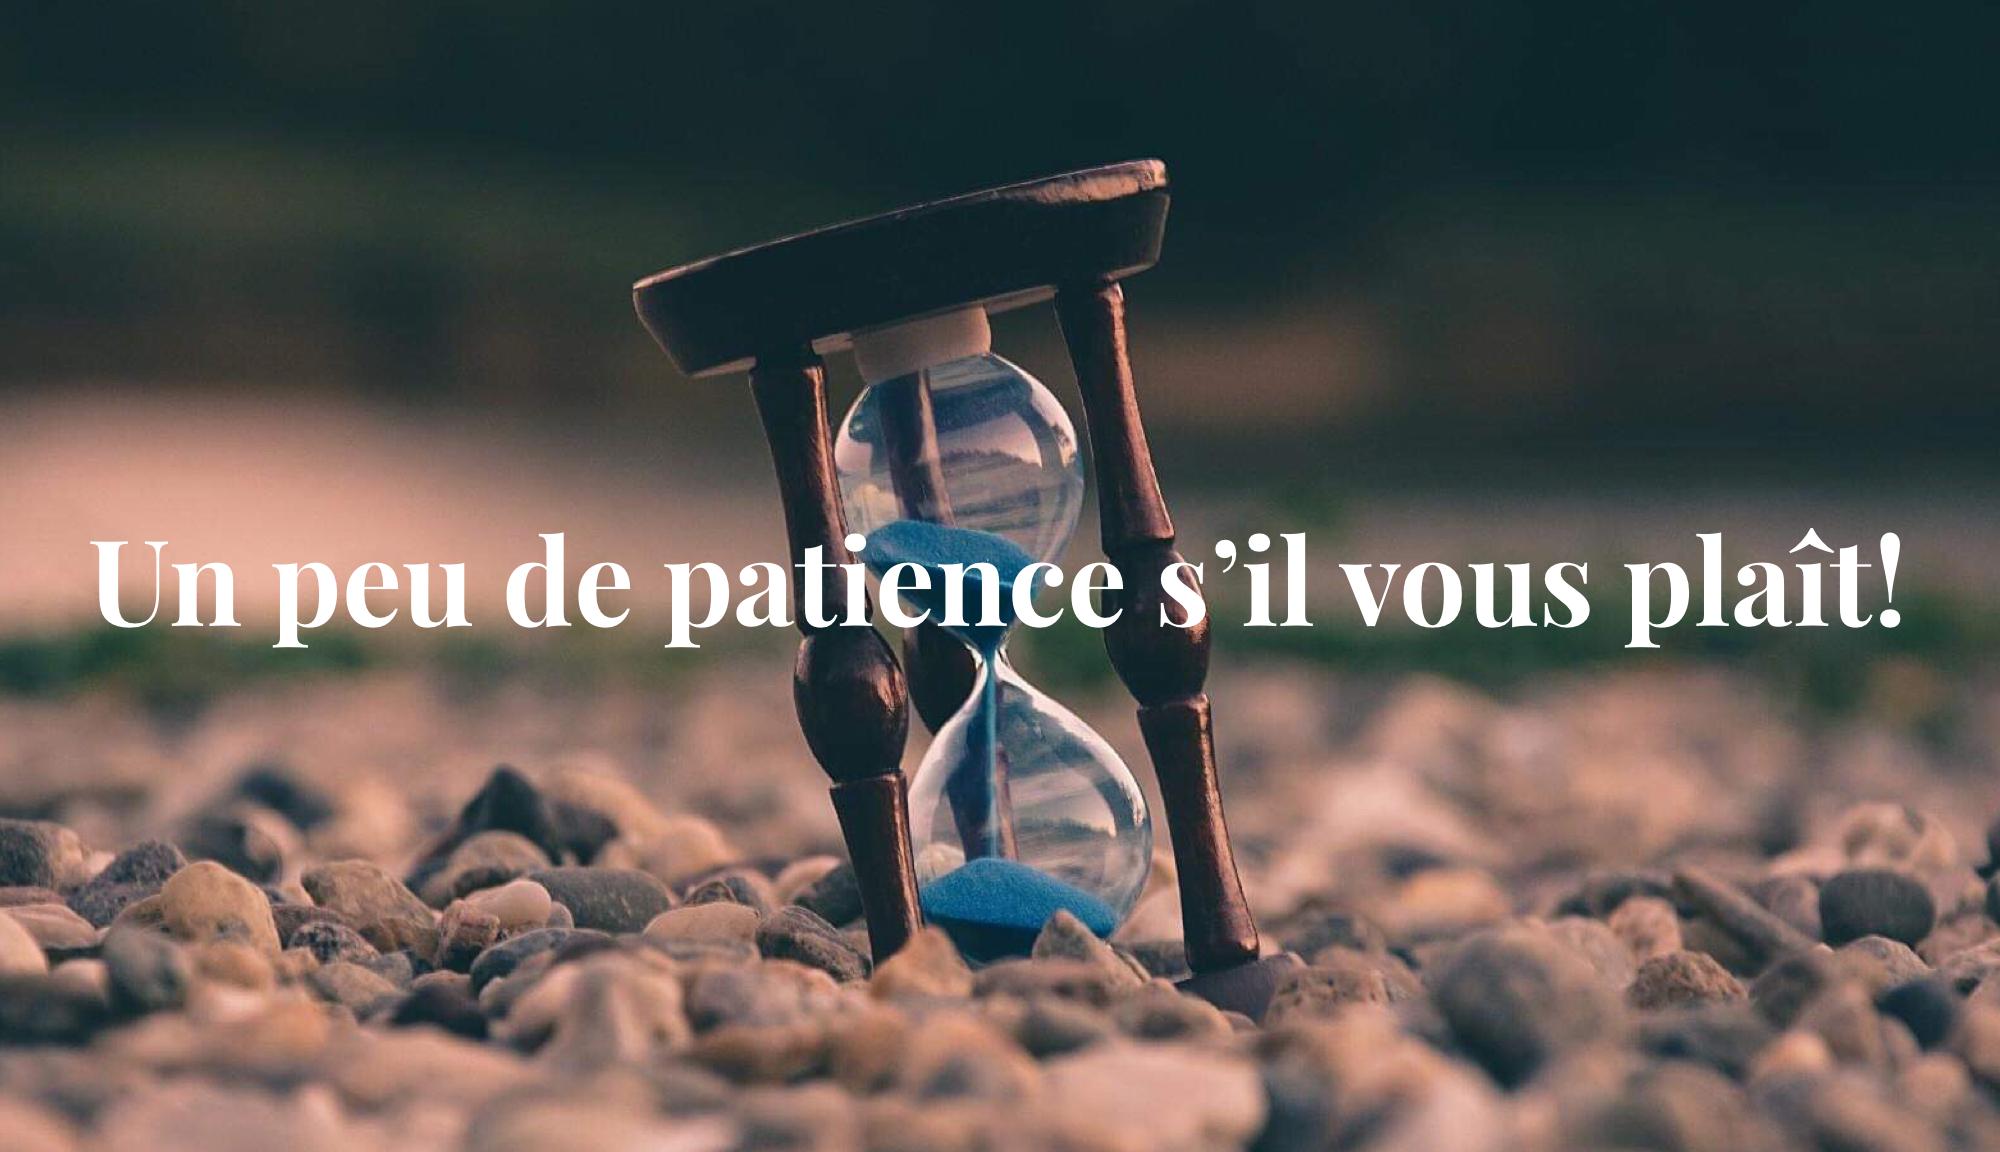 Un peu de patience